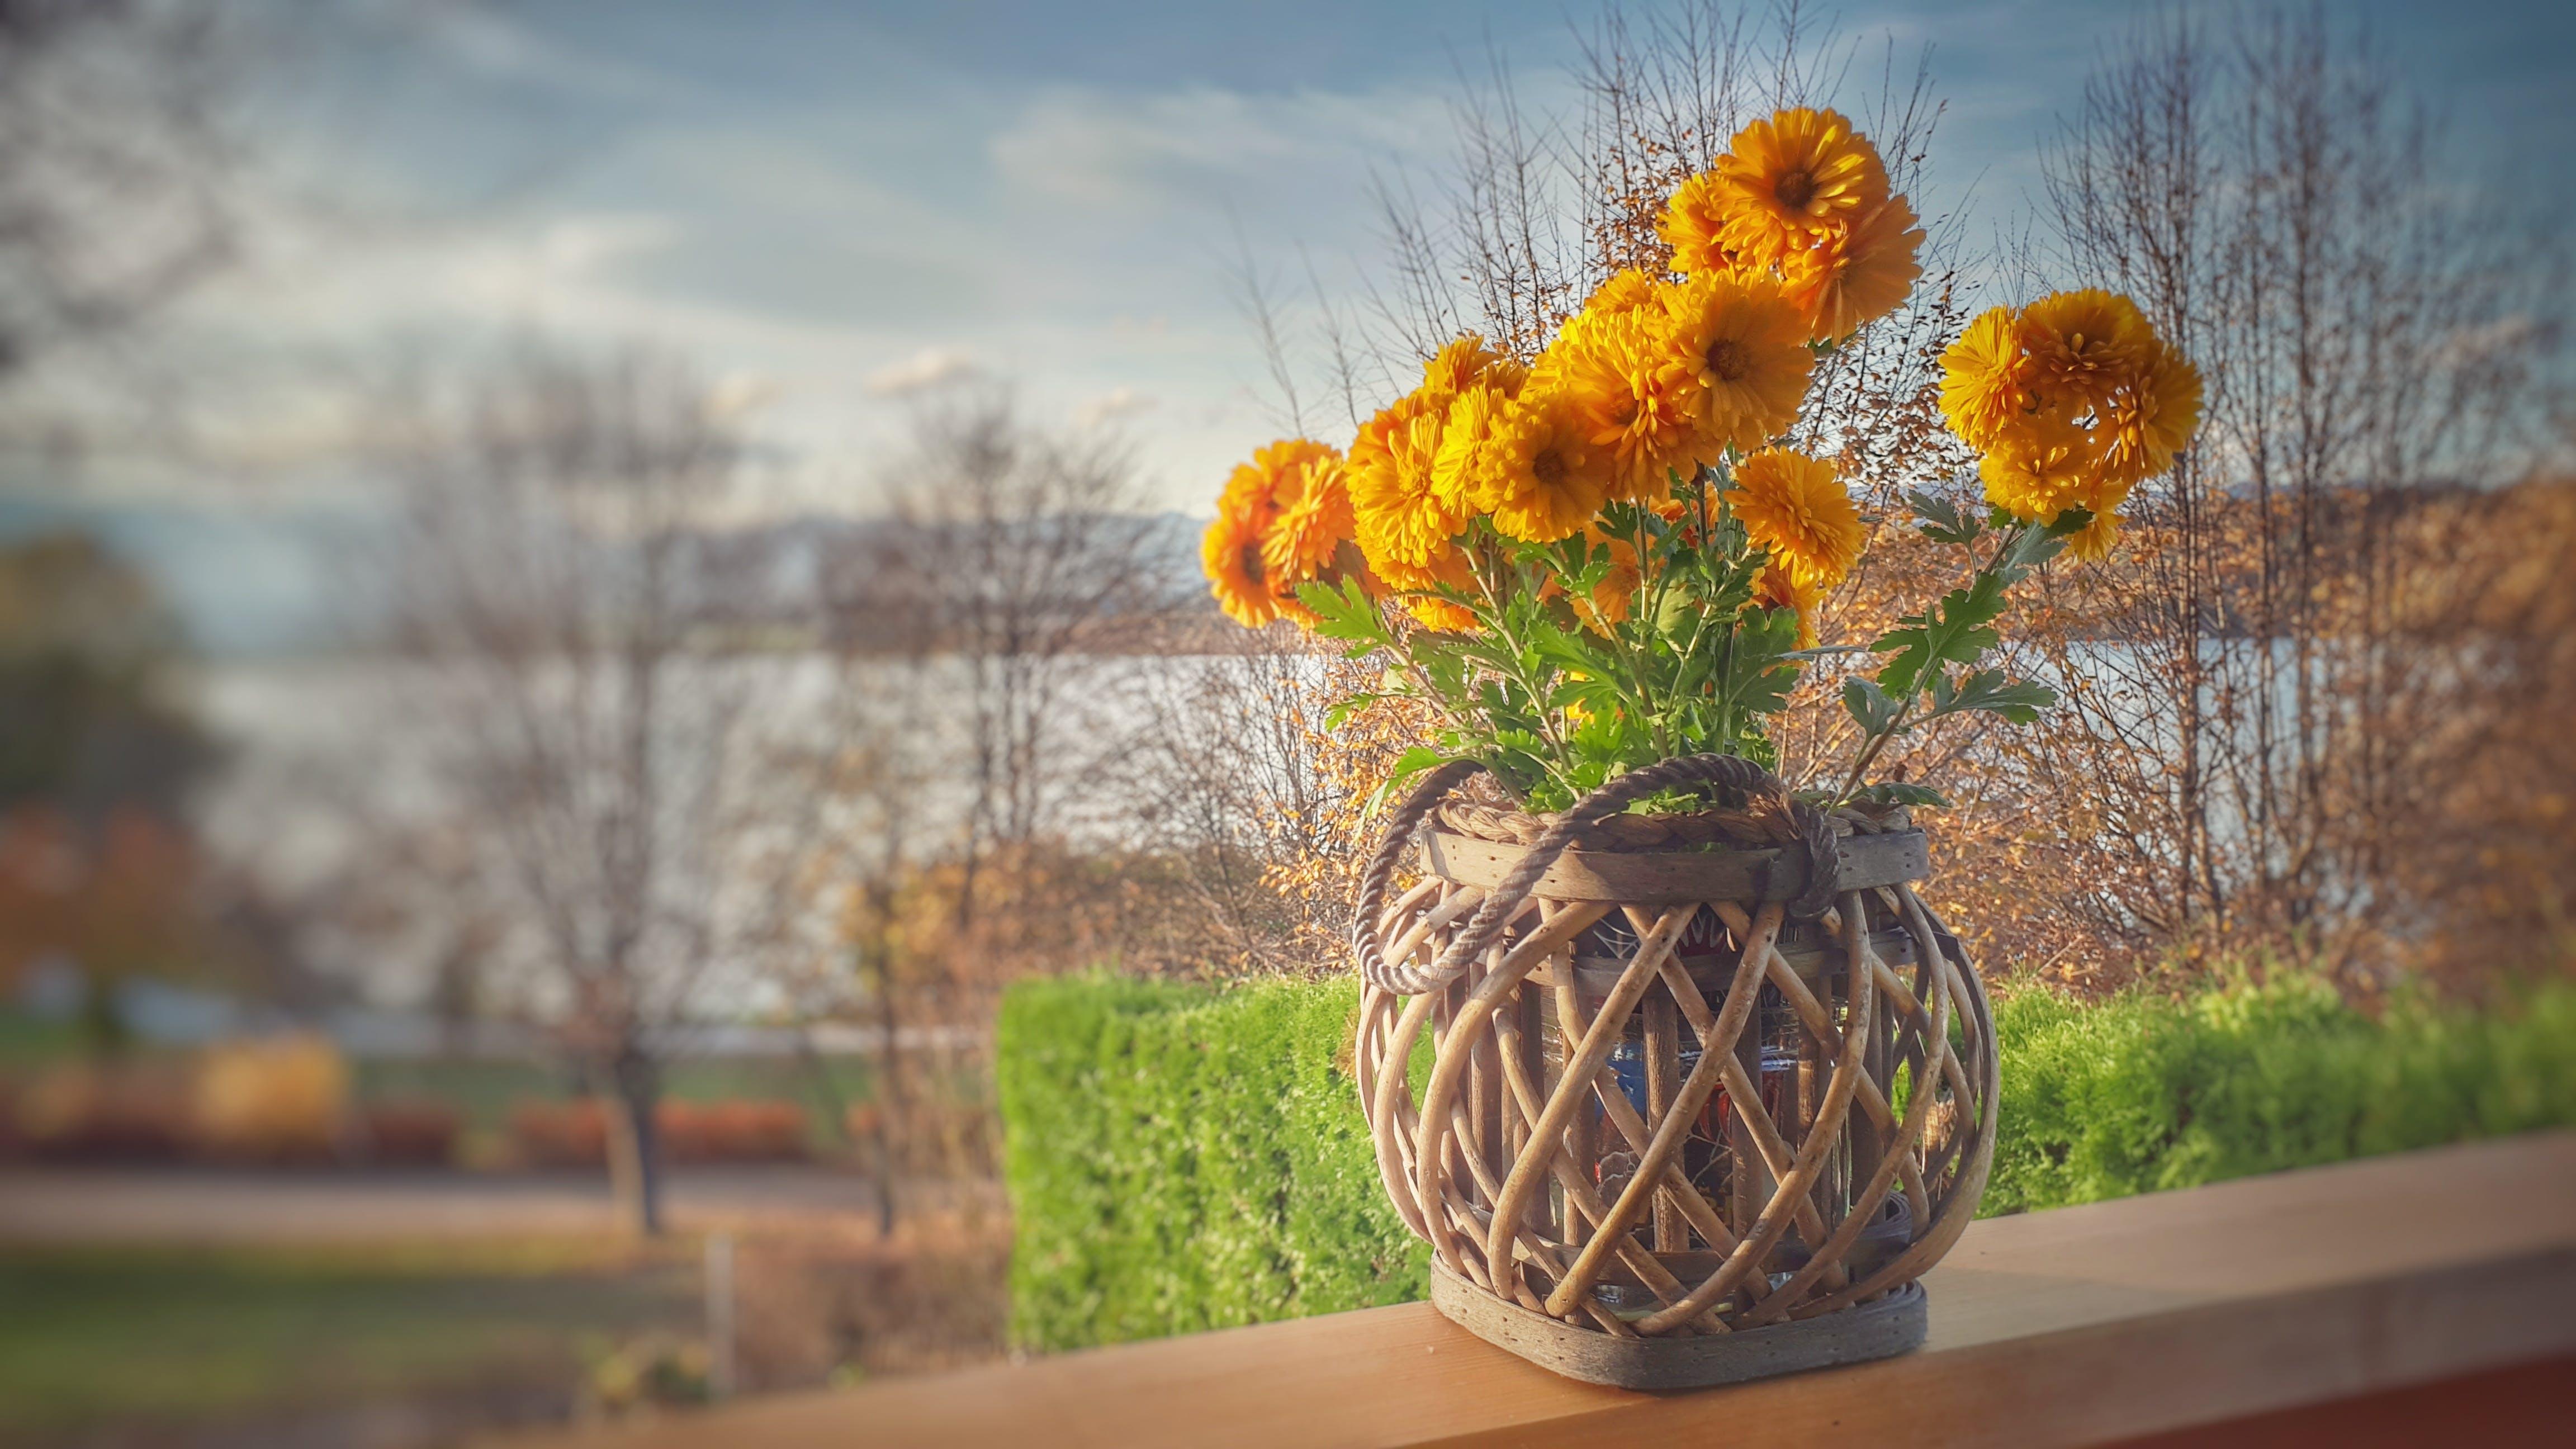 Orange Clustered Petaled Flowers in Brown Wicker Pot on Brown Wooden Plank